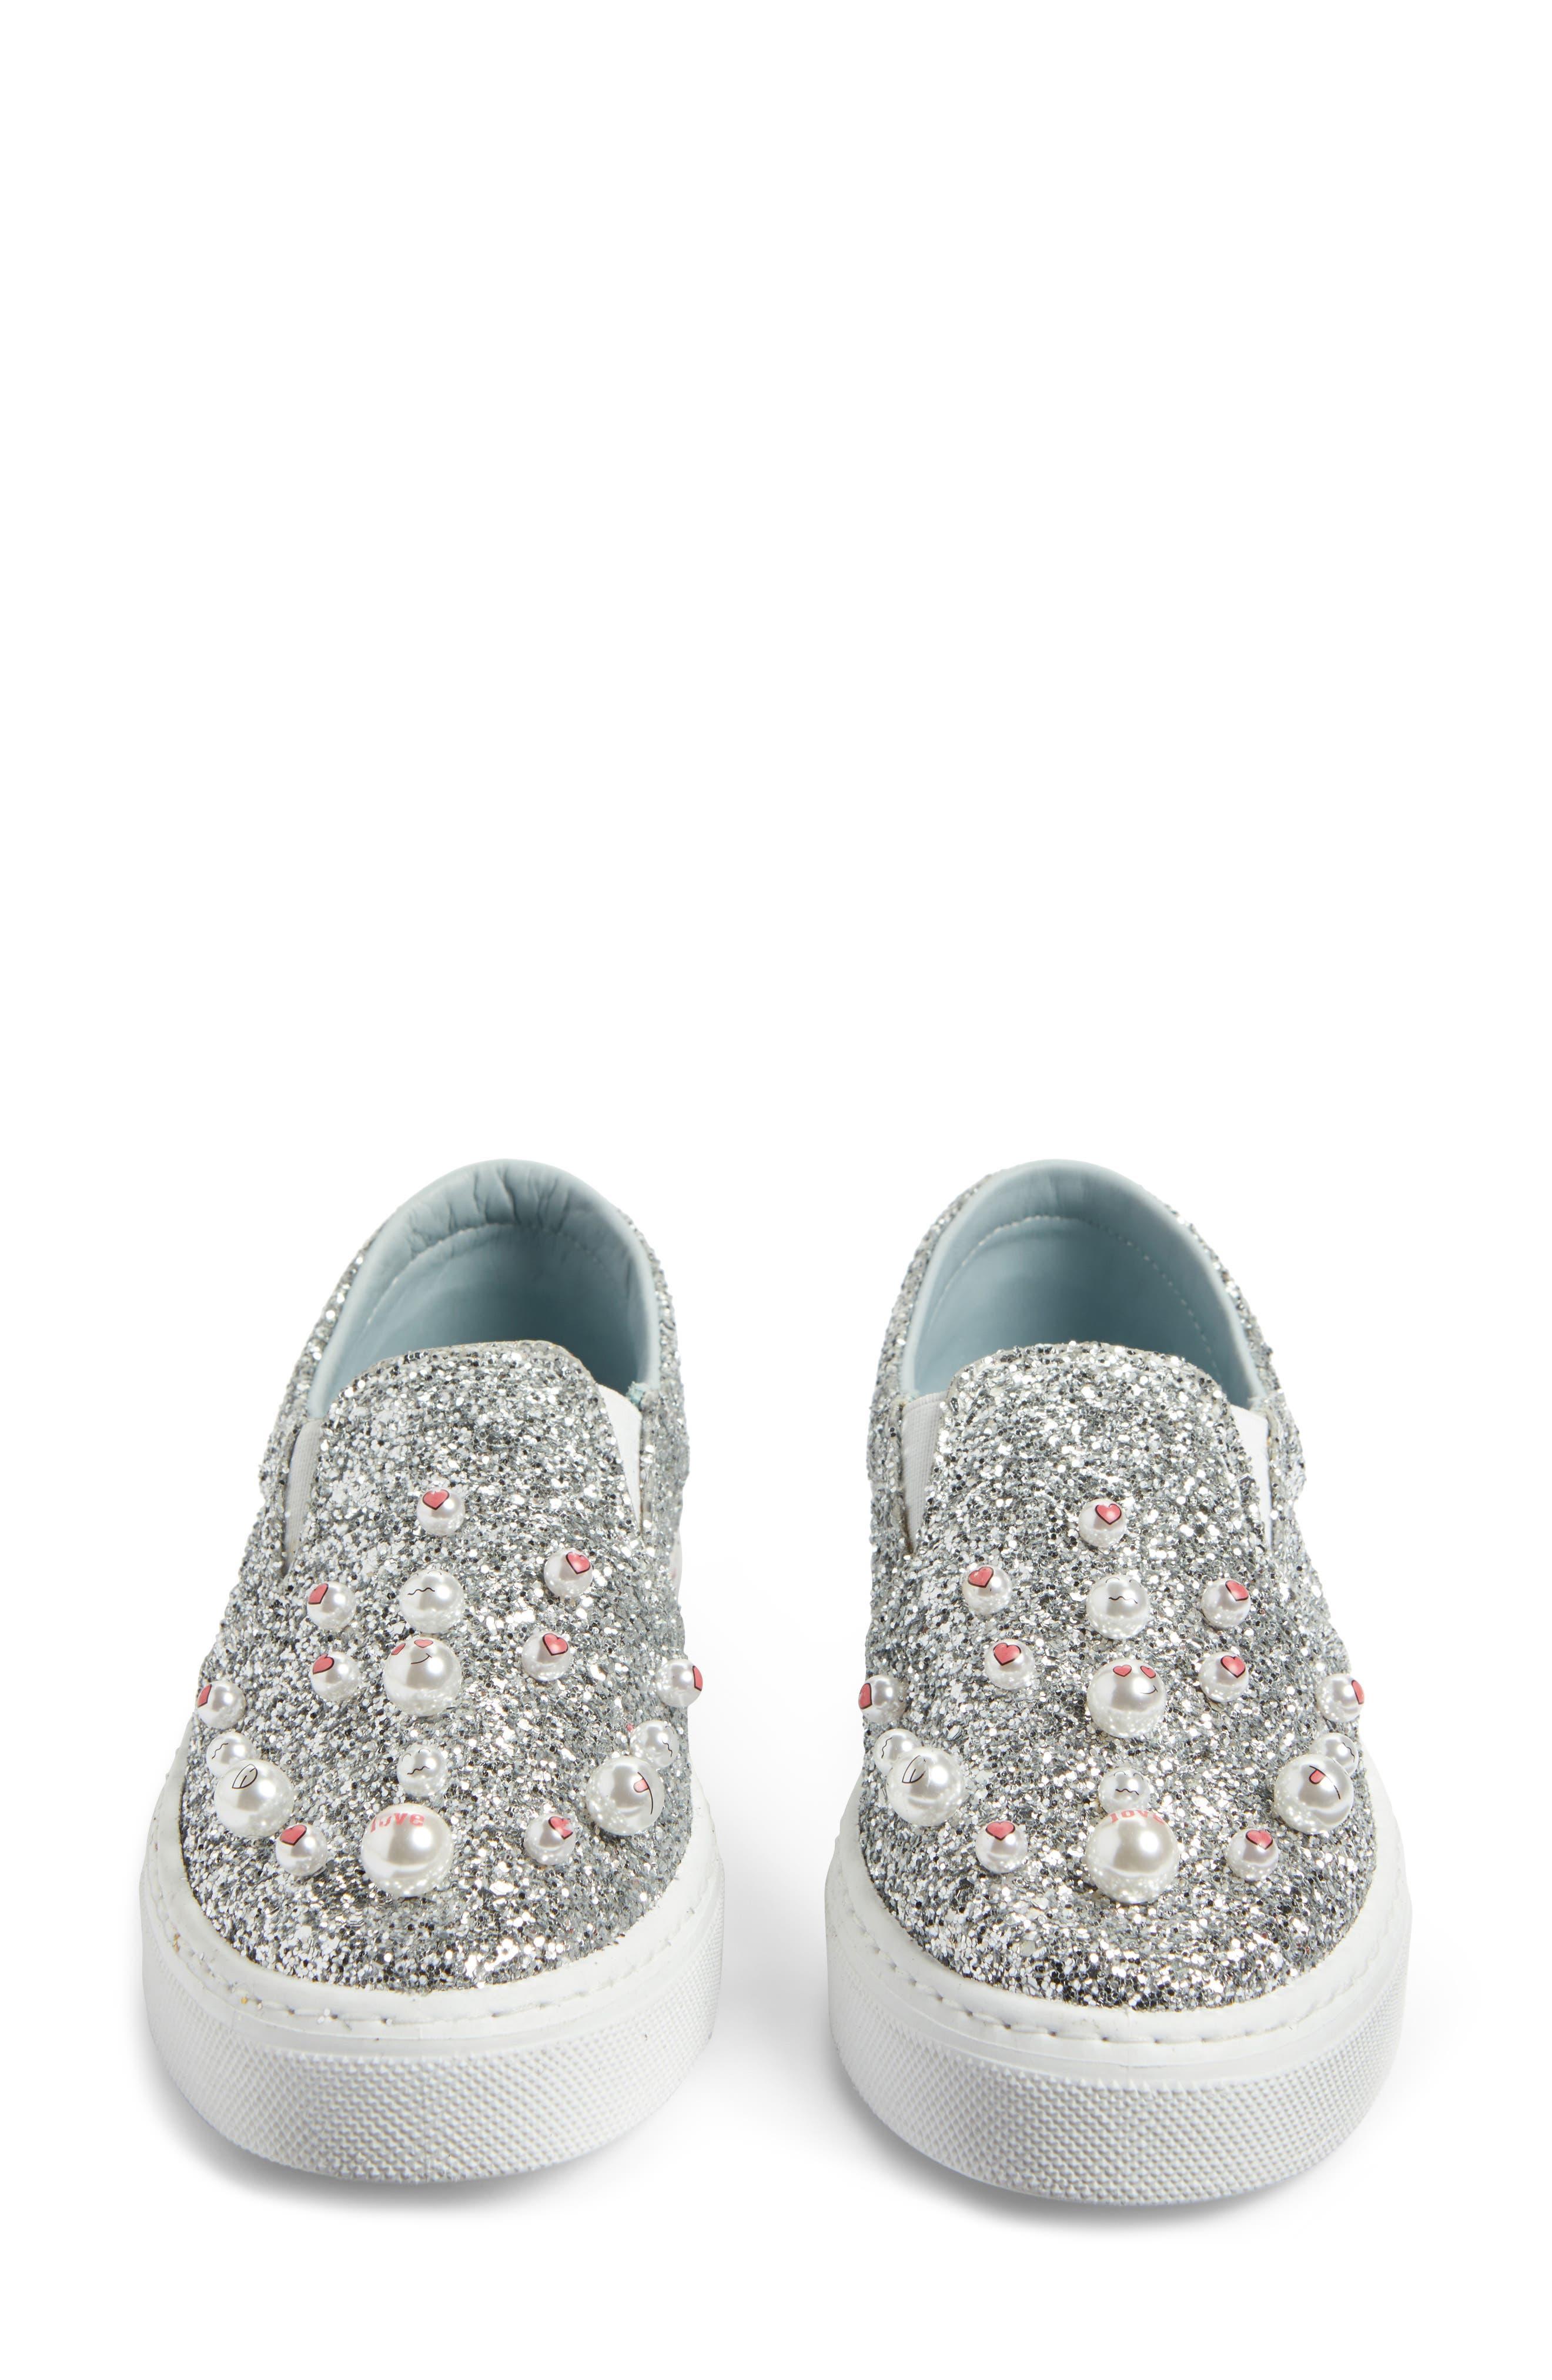 Candies Embellished Slip-On Sneaker,                             Alternate thumbnail 5, color,                             Silver